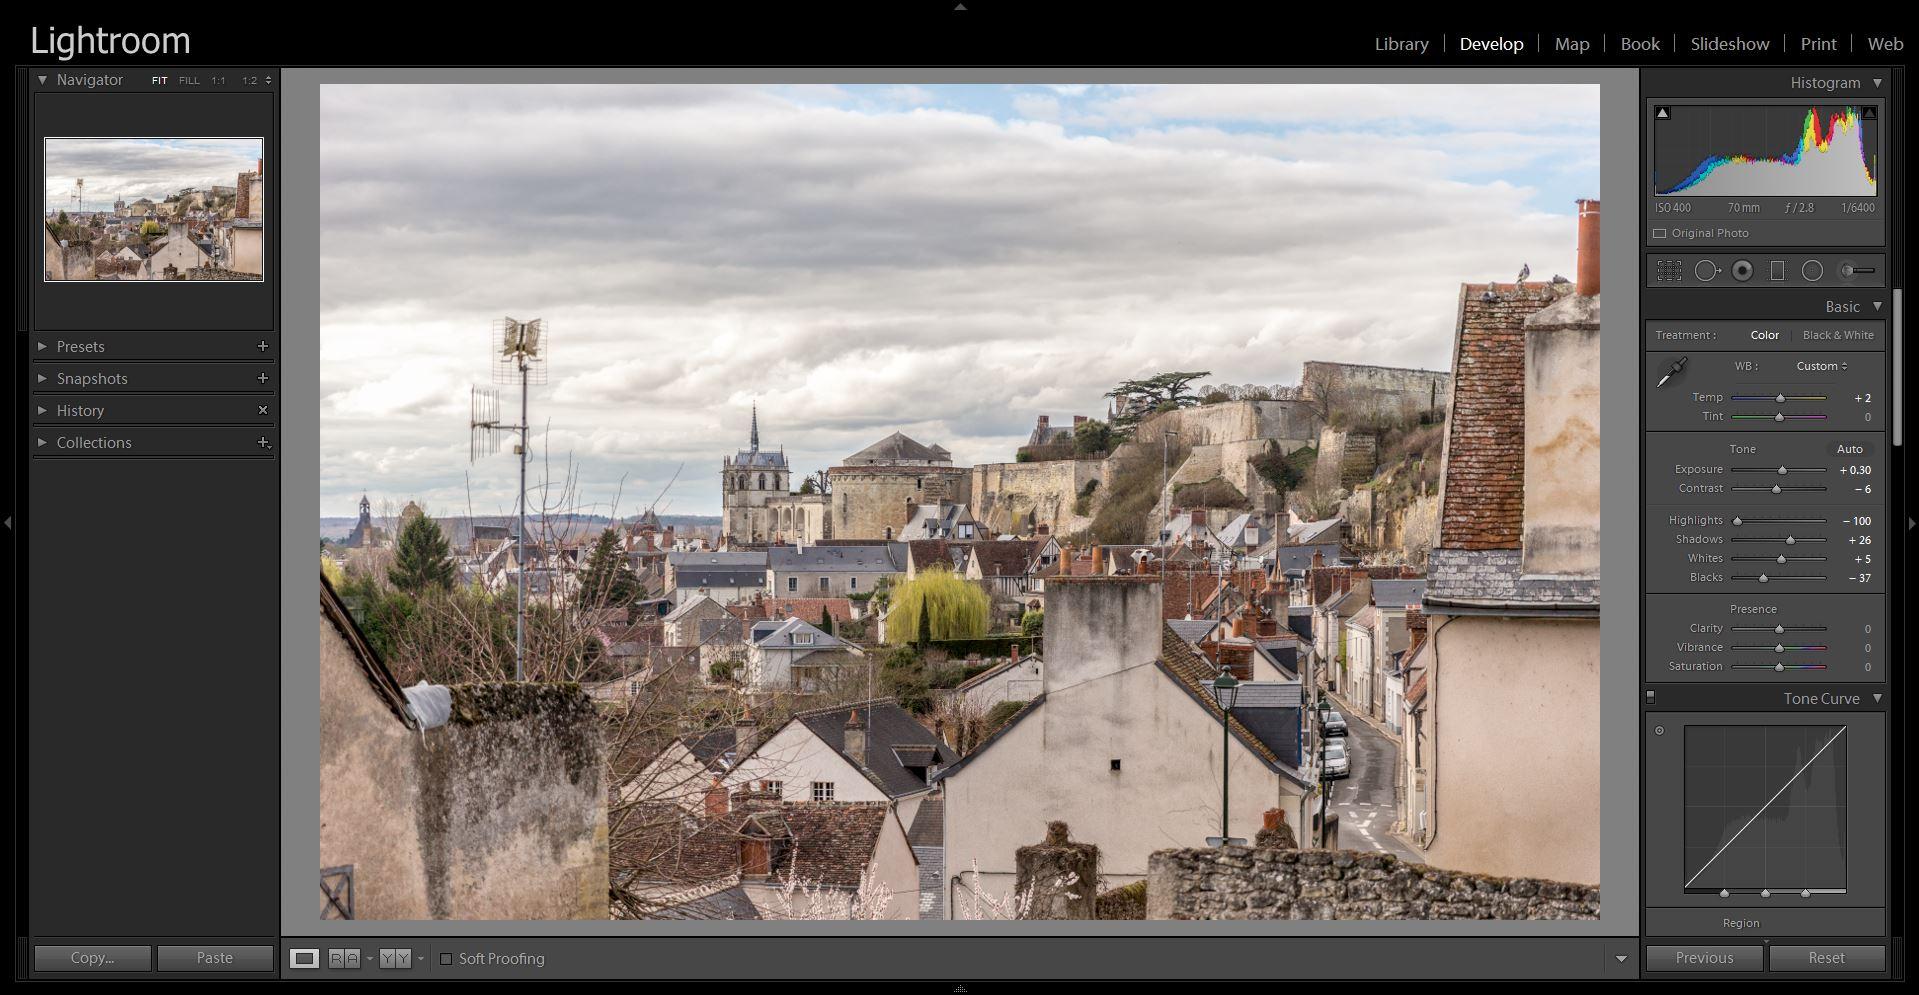 Adobe Lightroom Masterclass - 4 hours in Amboise, Loire Valley€80 per person.